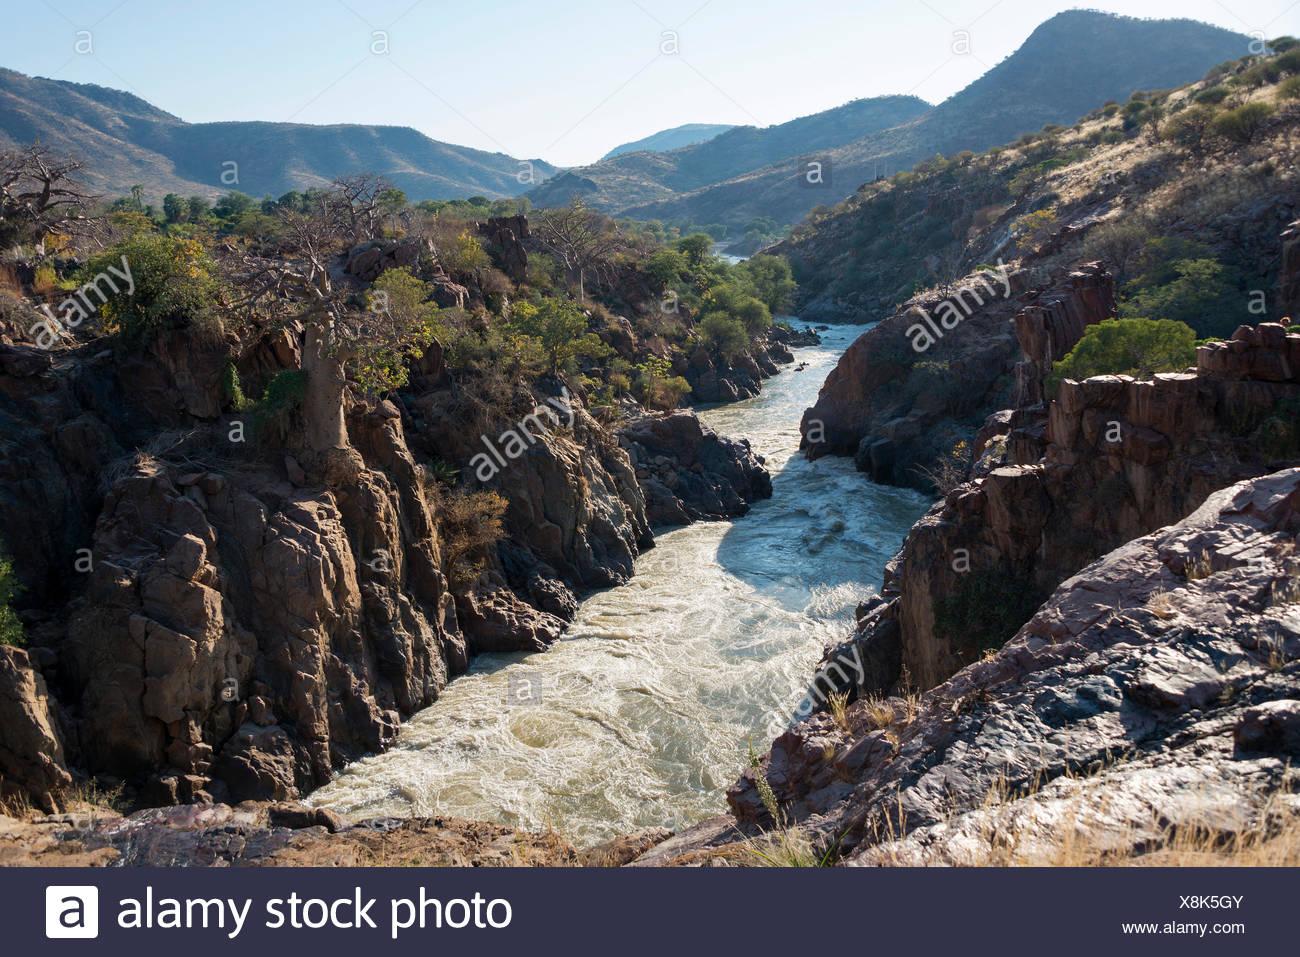 Epupa Falls, Kunene river, Kaokoveld, Namibia - Stock Image